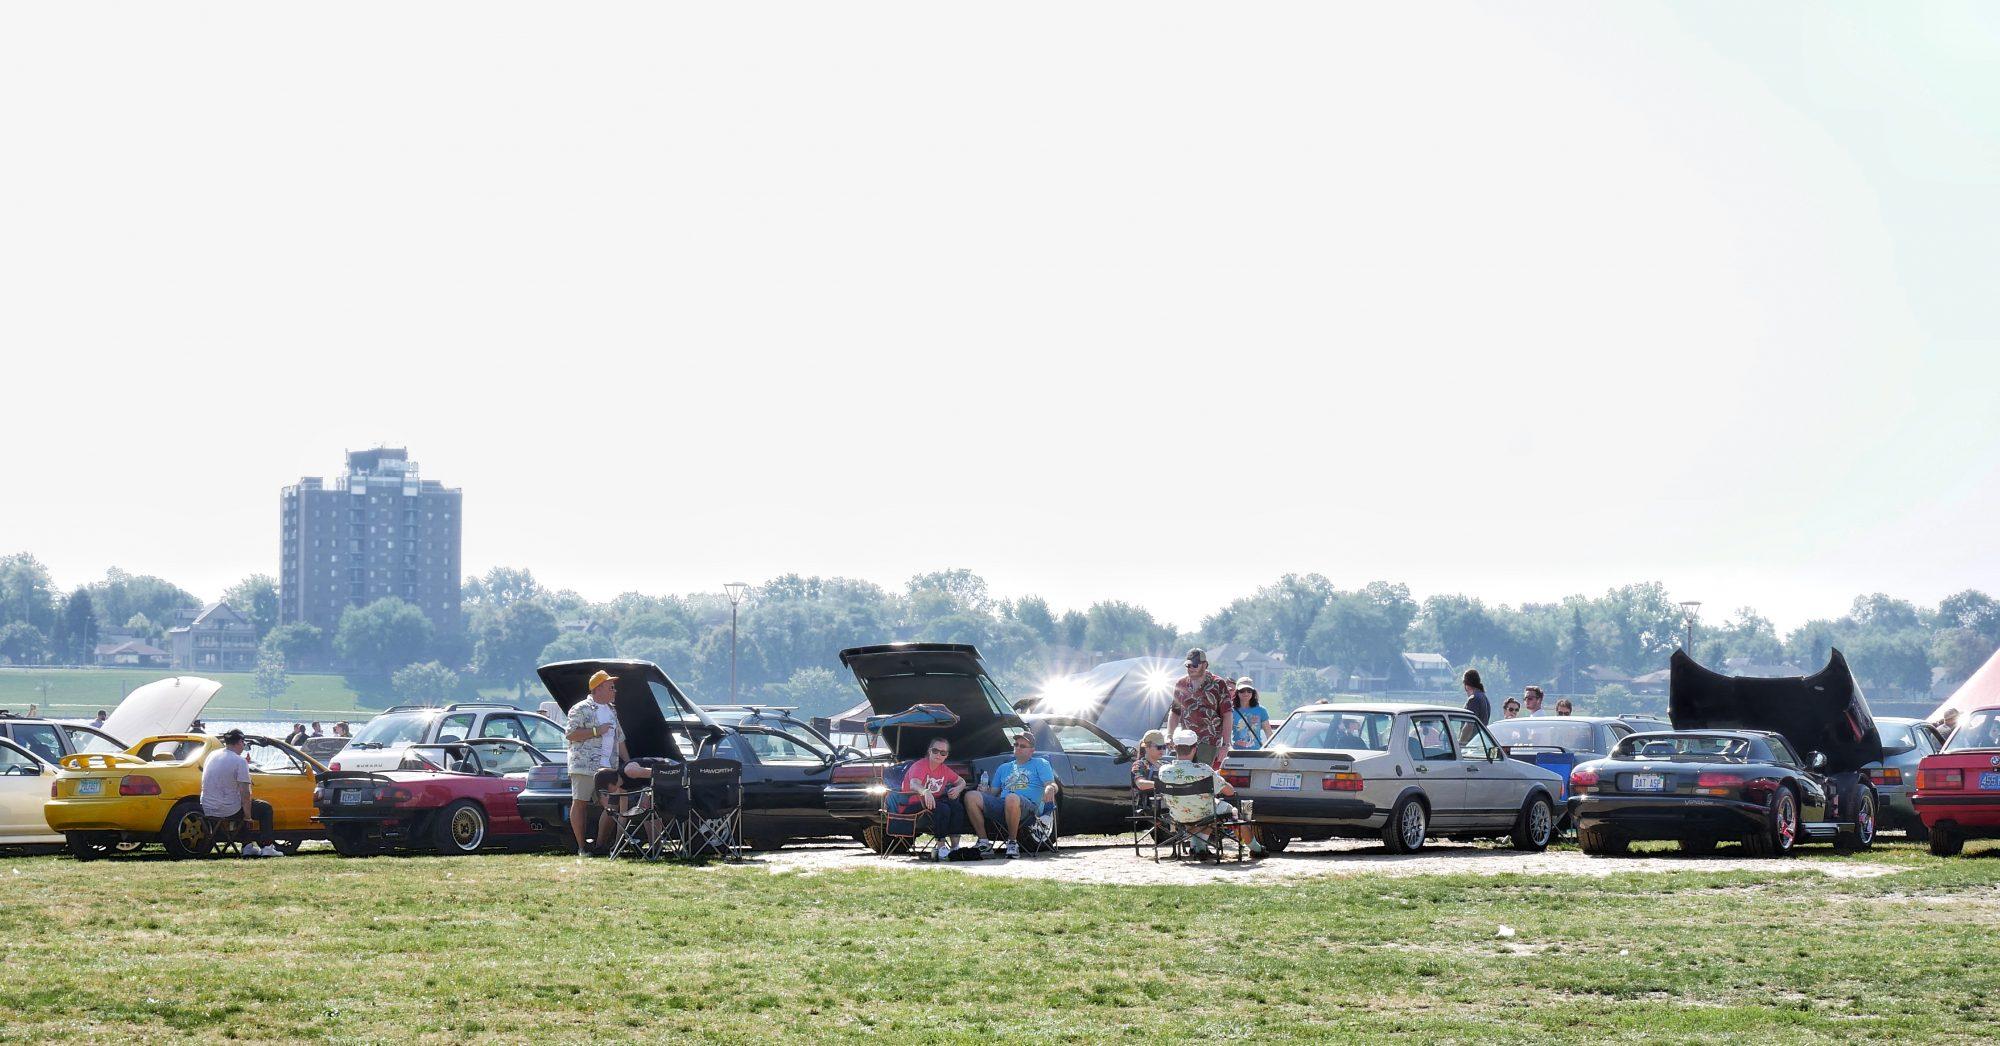 people viewing cars on display